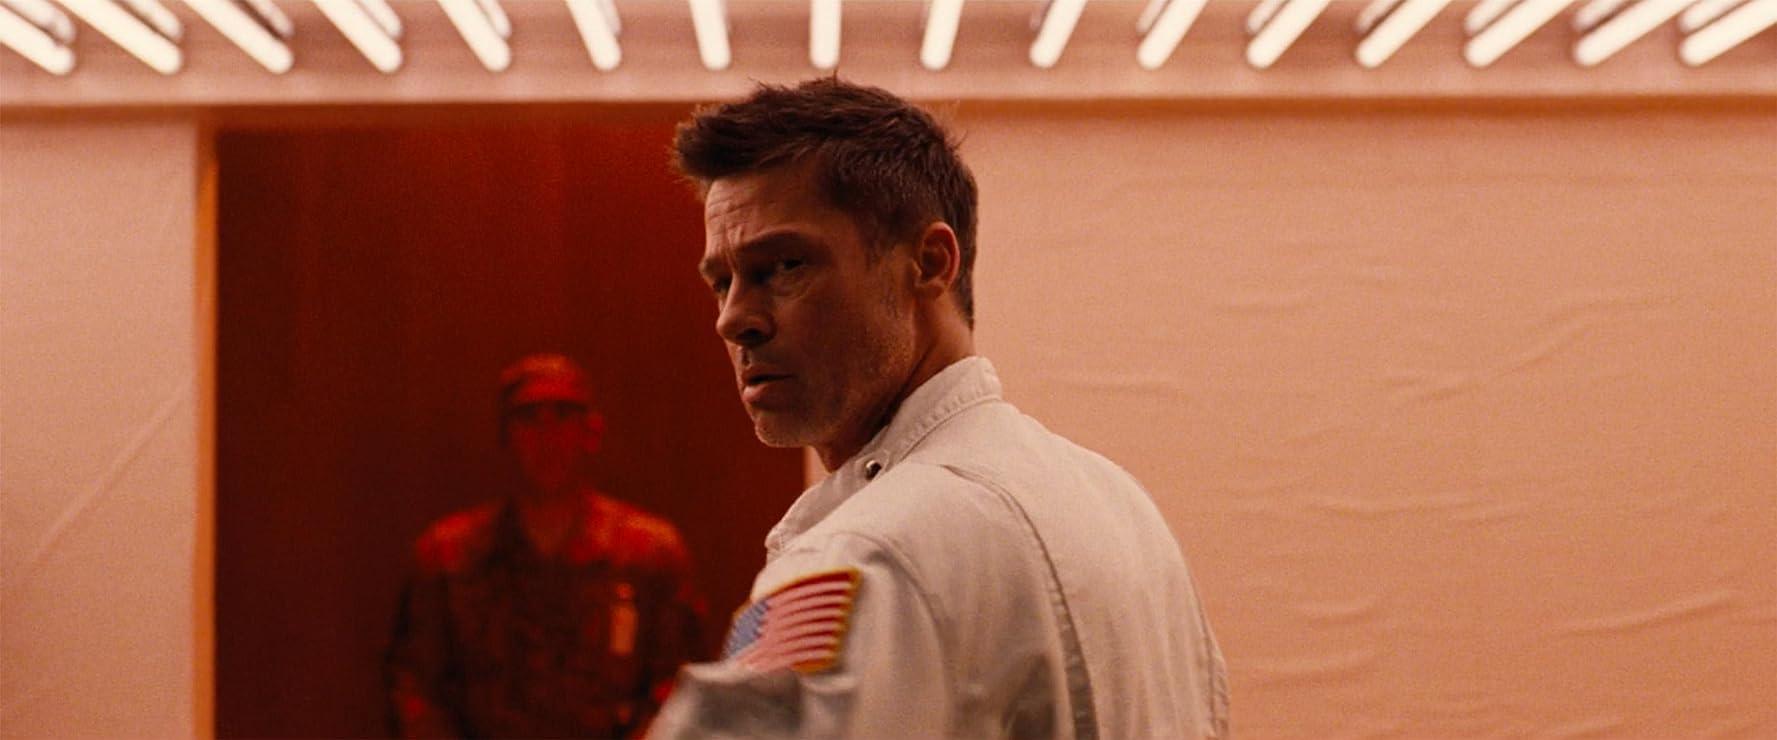 Brad Pitt in Ad Astra (2019)